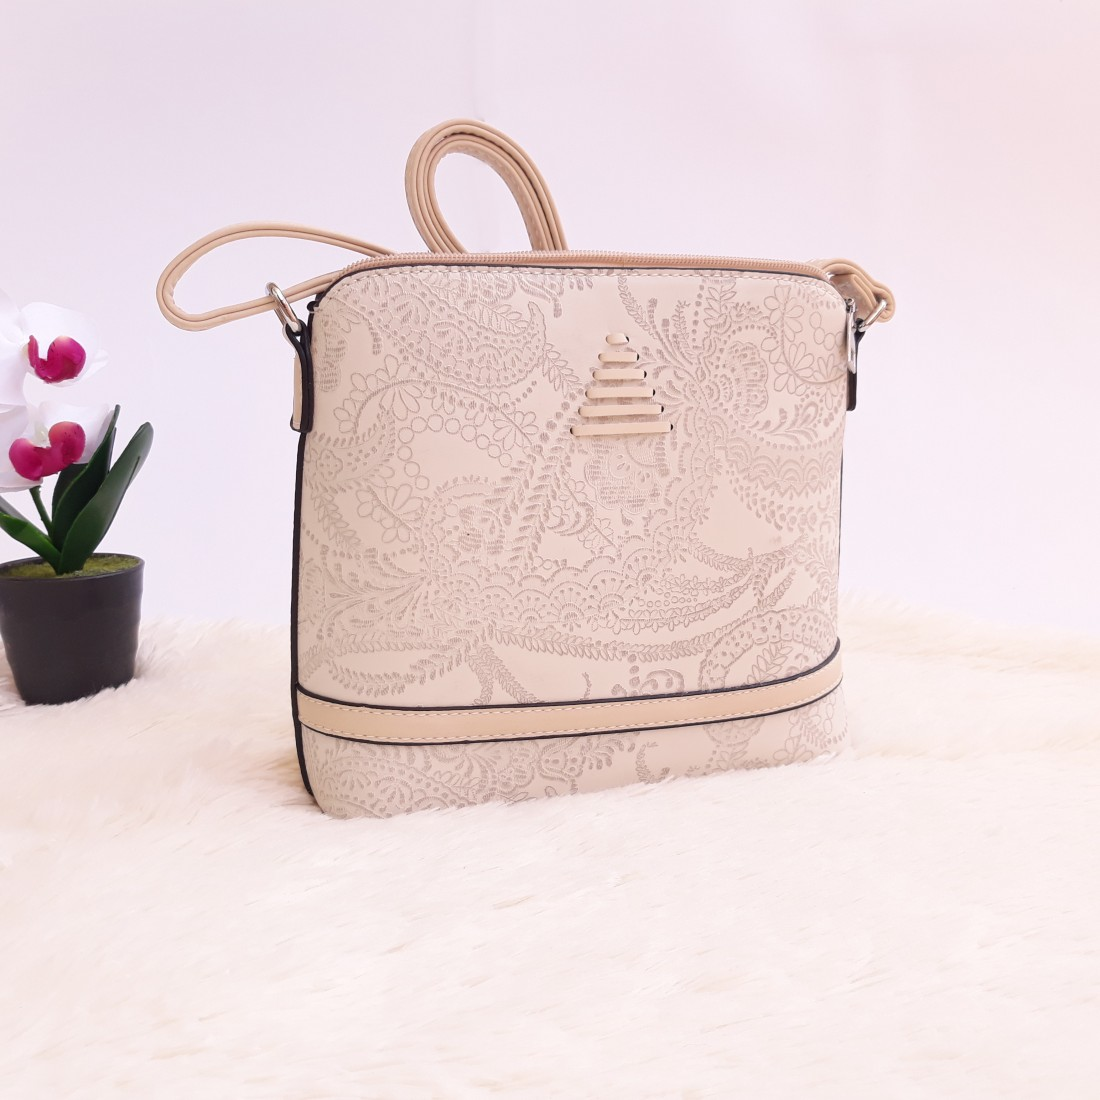 Дамска чанта през рамо - код 2913 - бежова